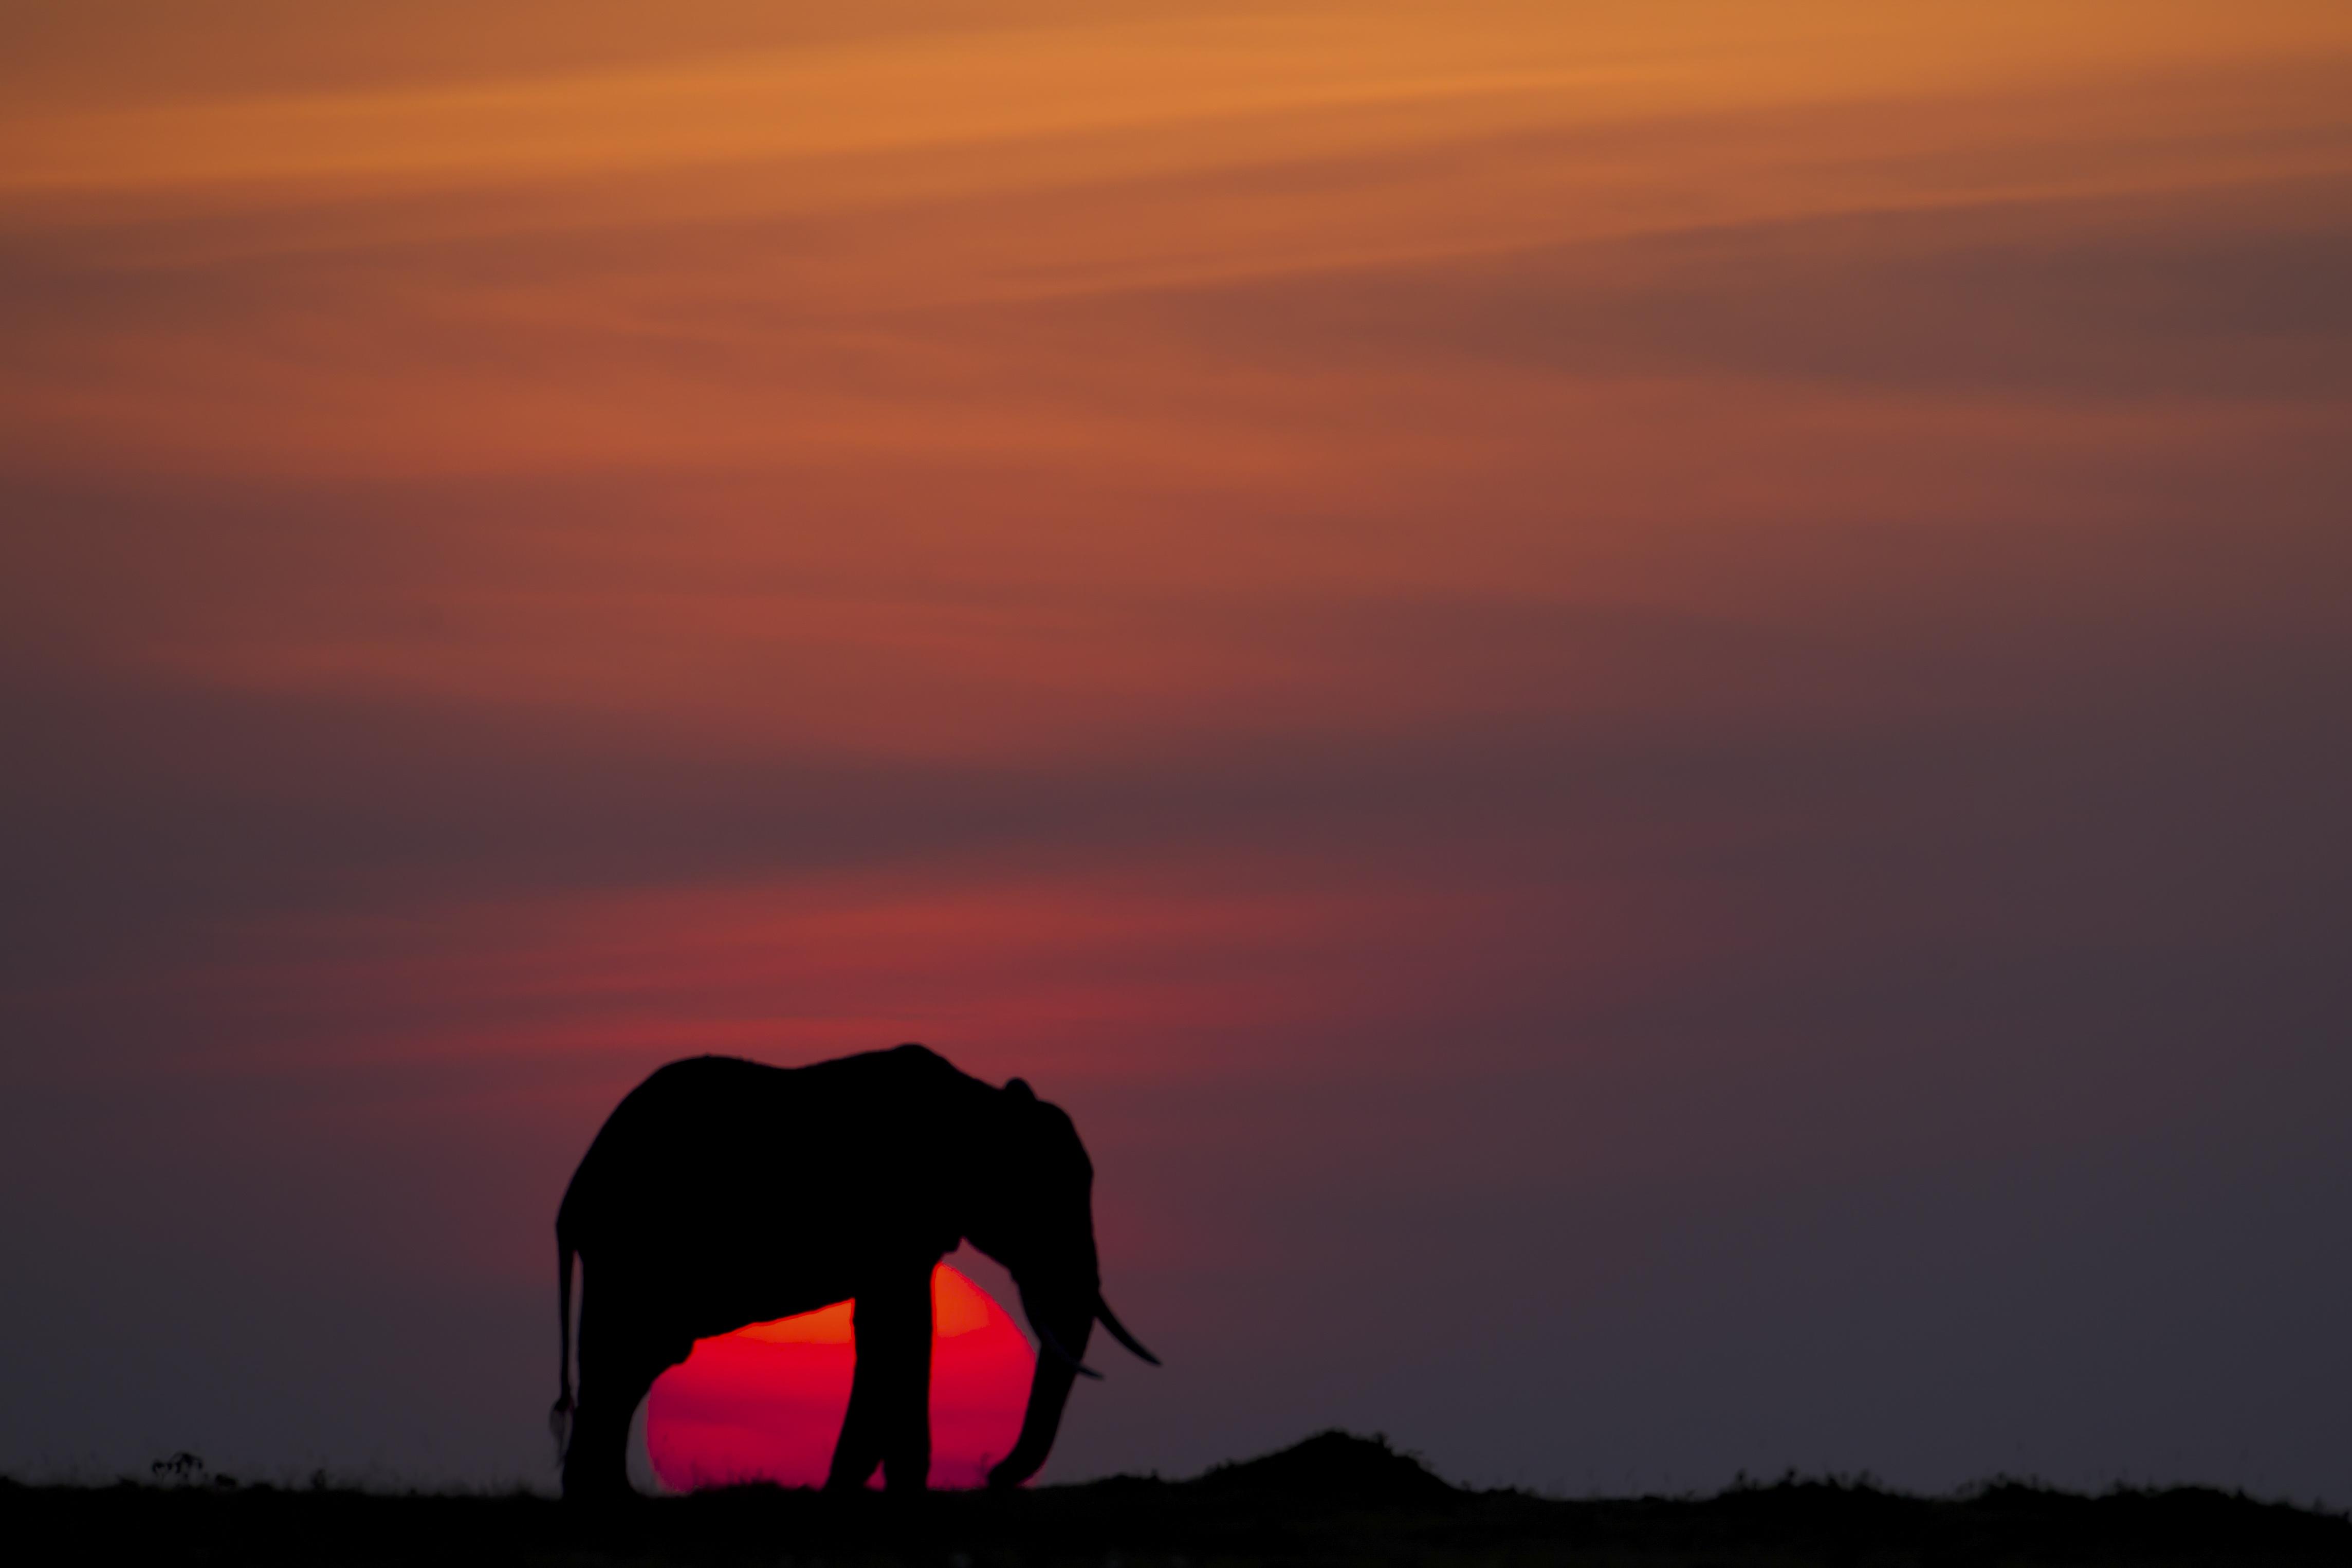 Blue Wildebeests at Sunrise, Masai Mara, Kenya  № 1443727 загрузить